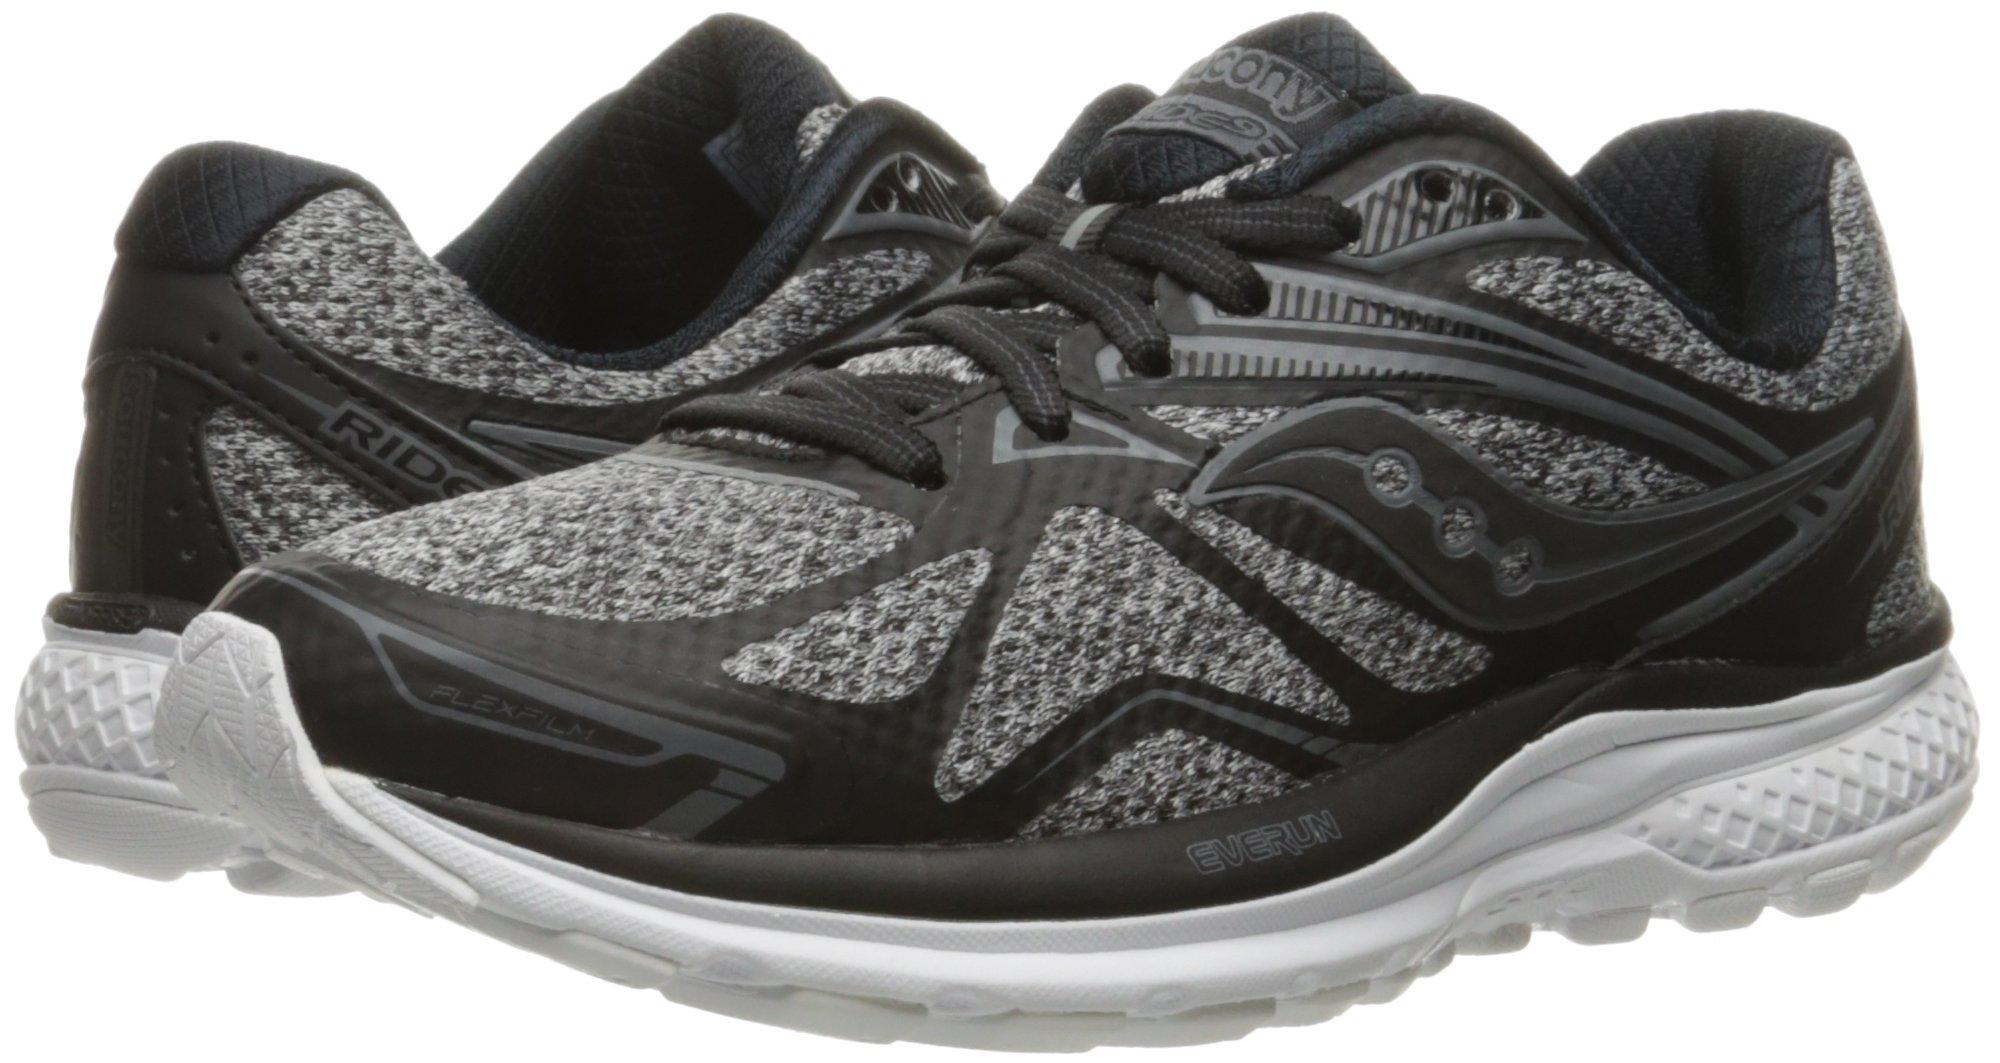 71NioRkjZKL - Saucony Women's Ride 9 Lr Running Shoe, Grey/Black, 5 M US